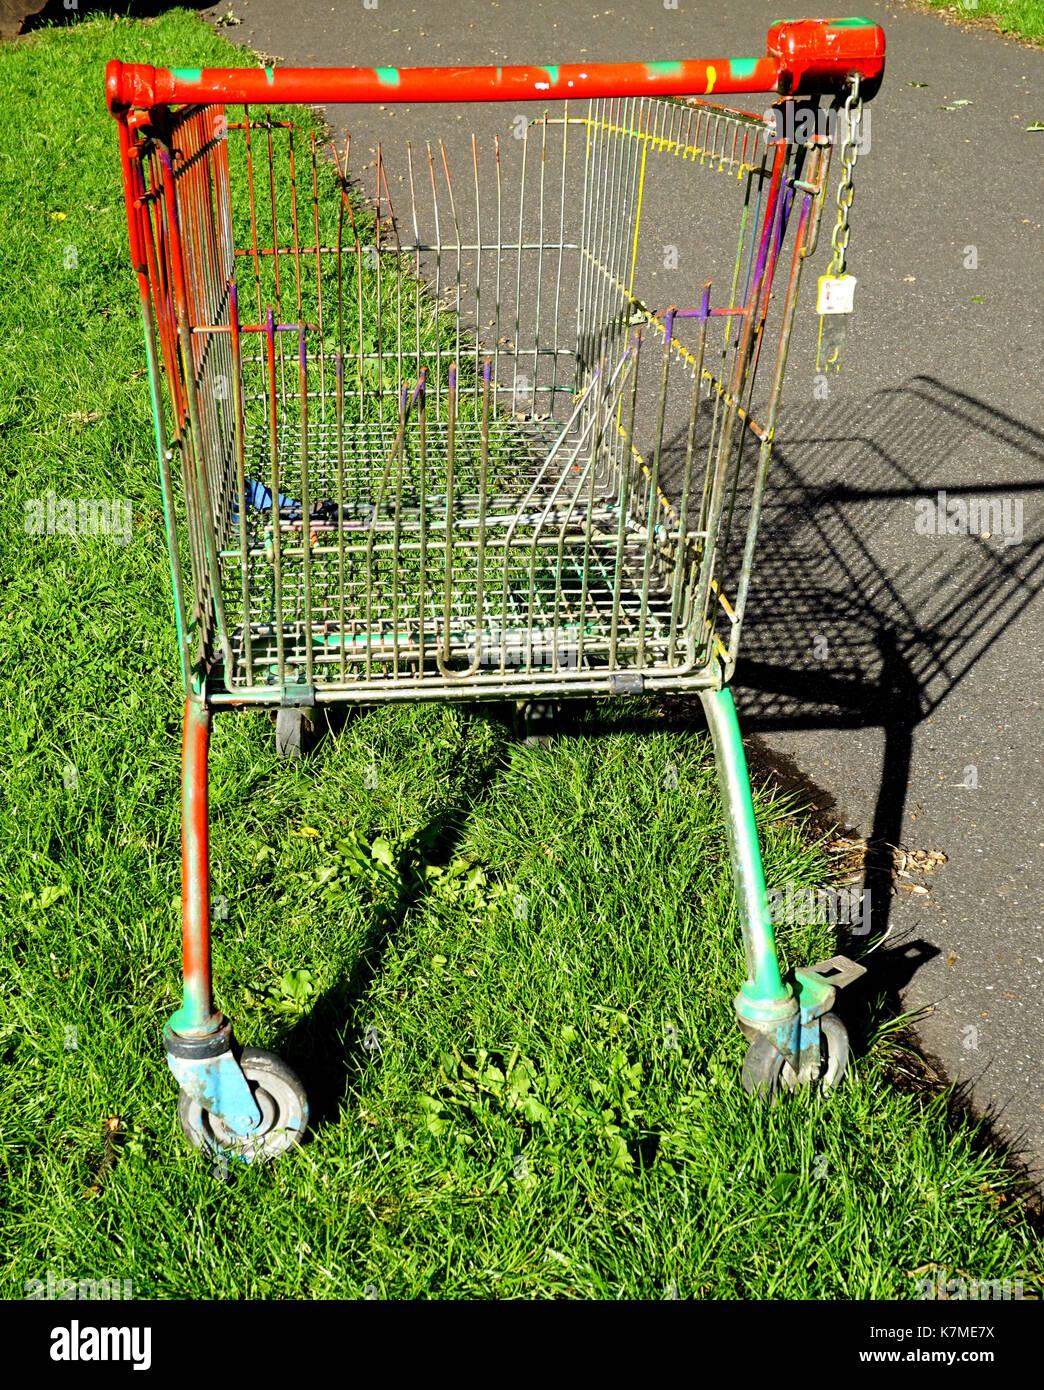 Supermarket trolley, dumped and broken. - Stock Image